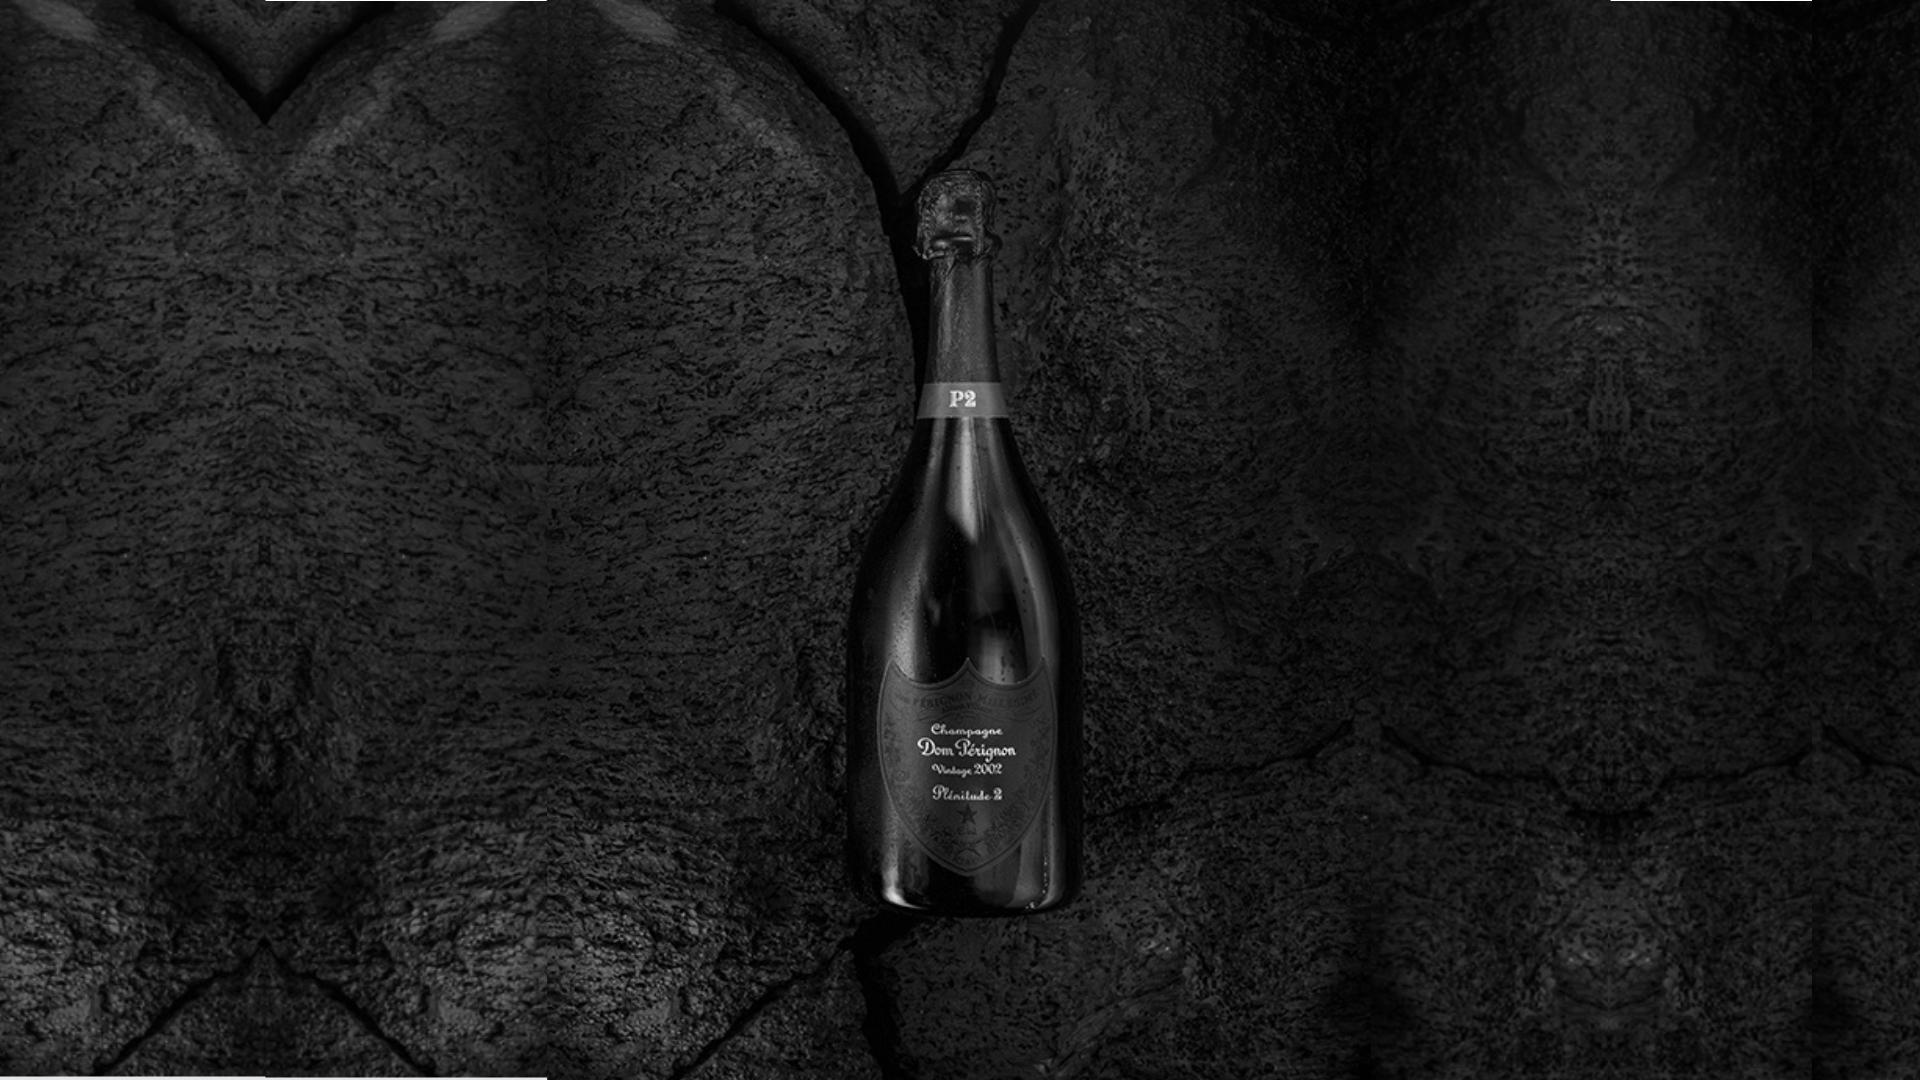 kham-pha-dom-perignon-vintage-2002-plenitude-2-tai-angelina